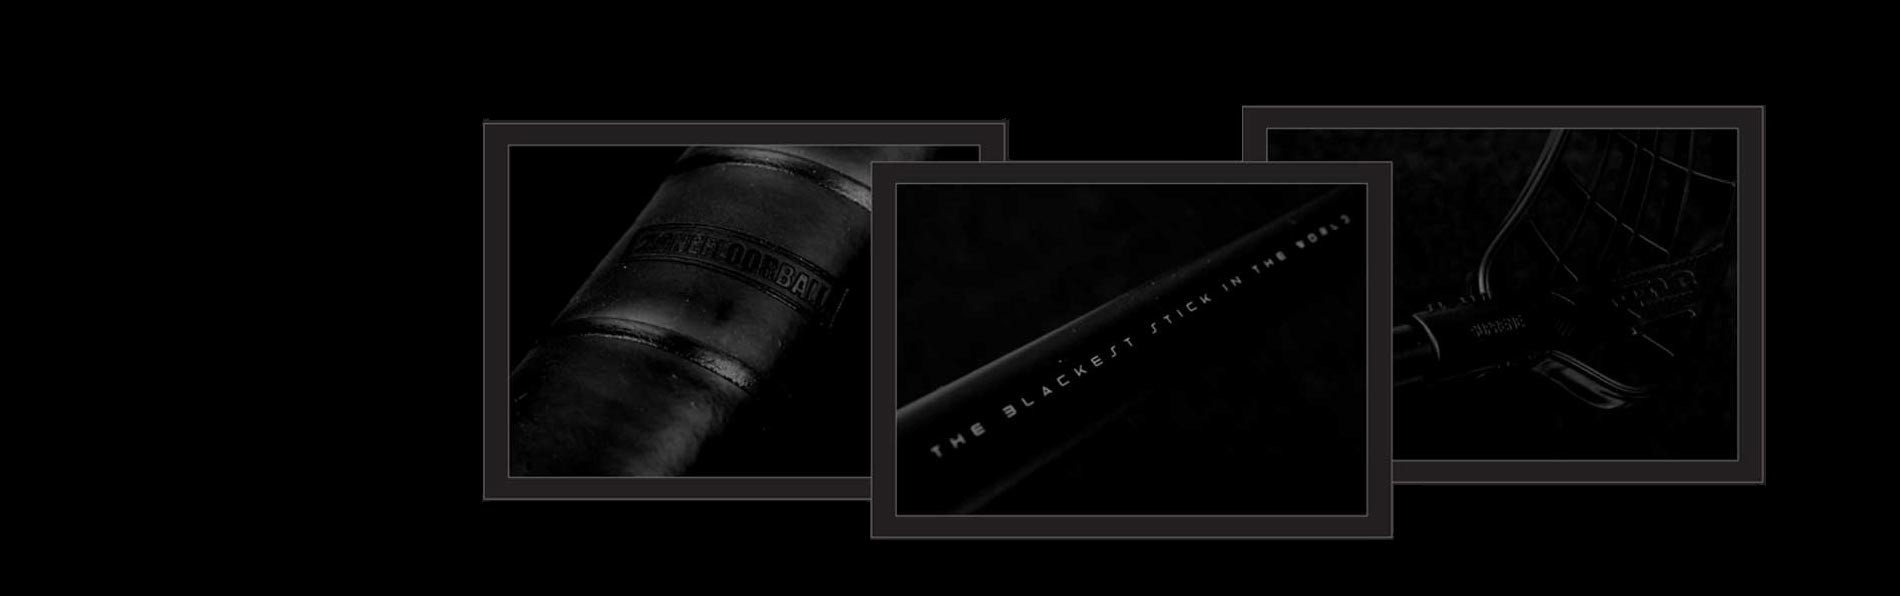 Limitovaná kolekce Zone The Blackest skladem!